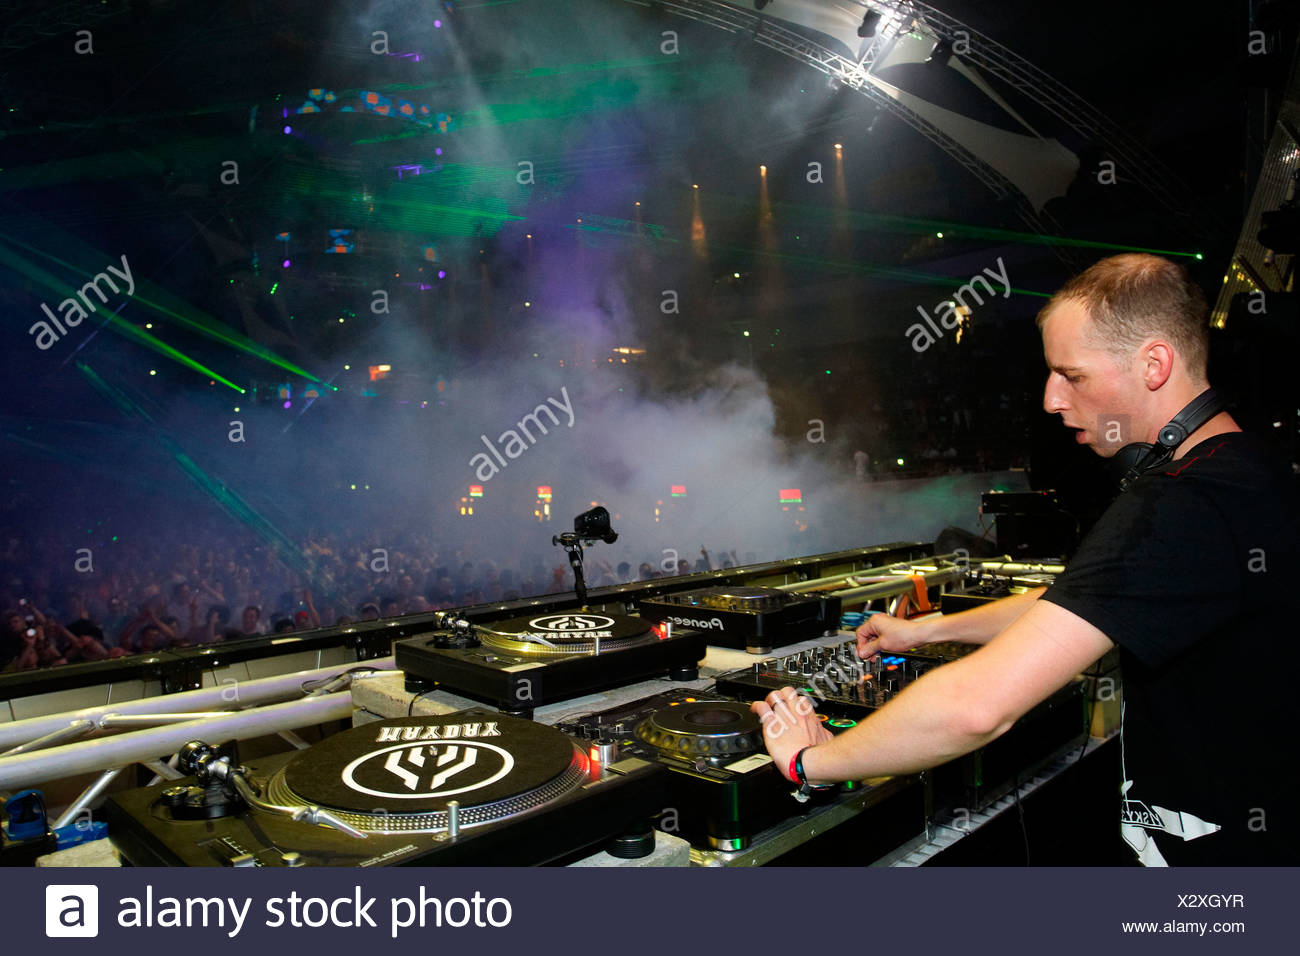 DJ Felix Kroecher, techno festival Mayday 2010 in the Westfalenhalle concert hall, Dortmund, North Rhine-Westphalia - Stock Image